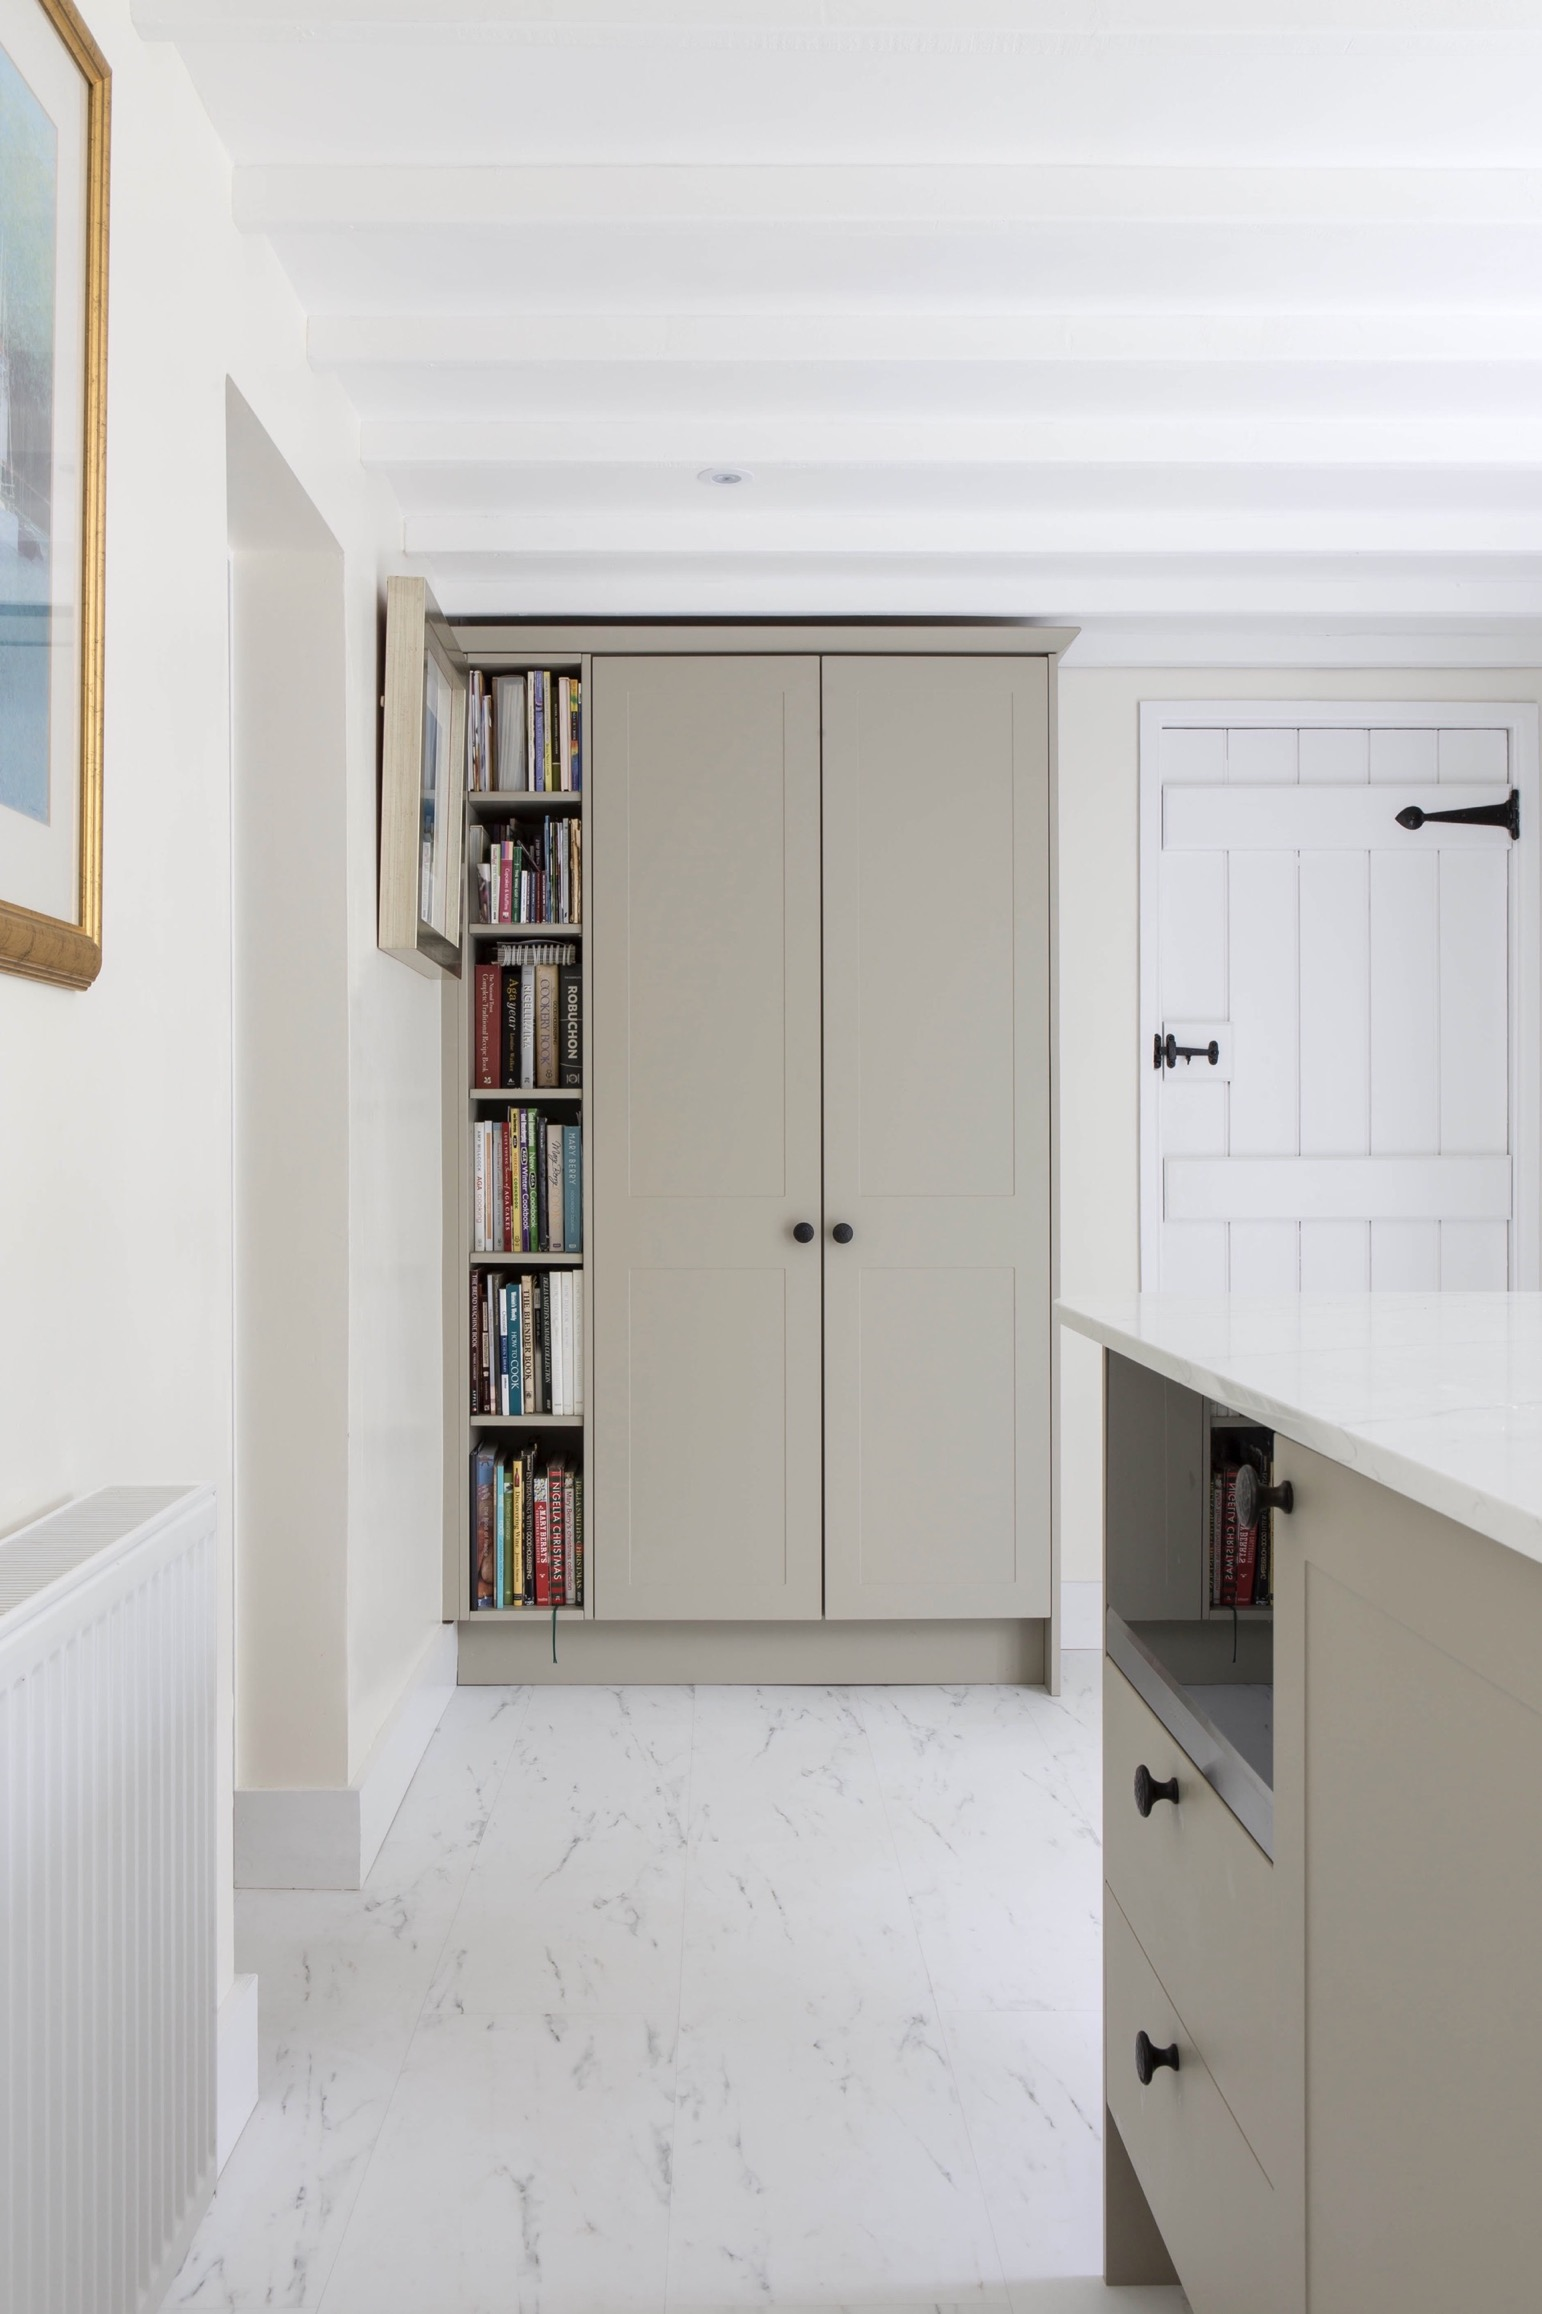 tall bookshelf kitchen bespoke island white silestone worktops worminghall oakley buckinghamshire 1